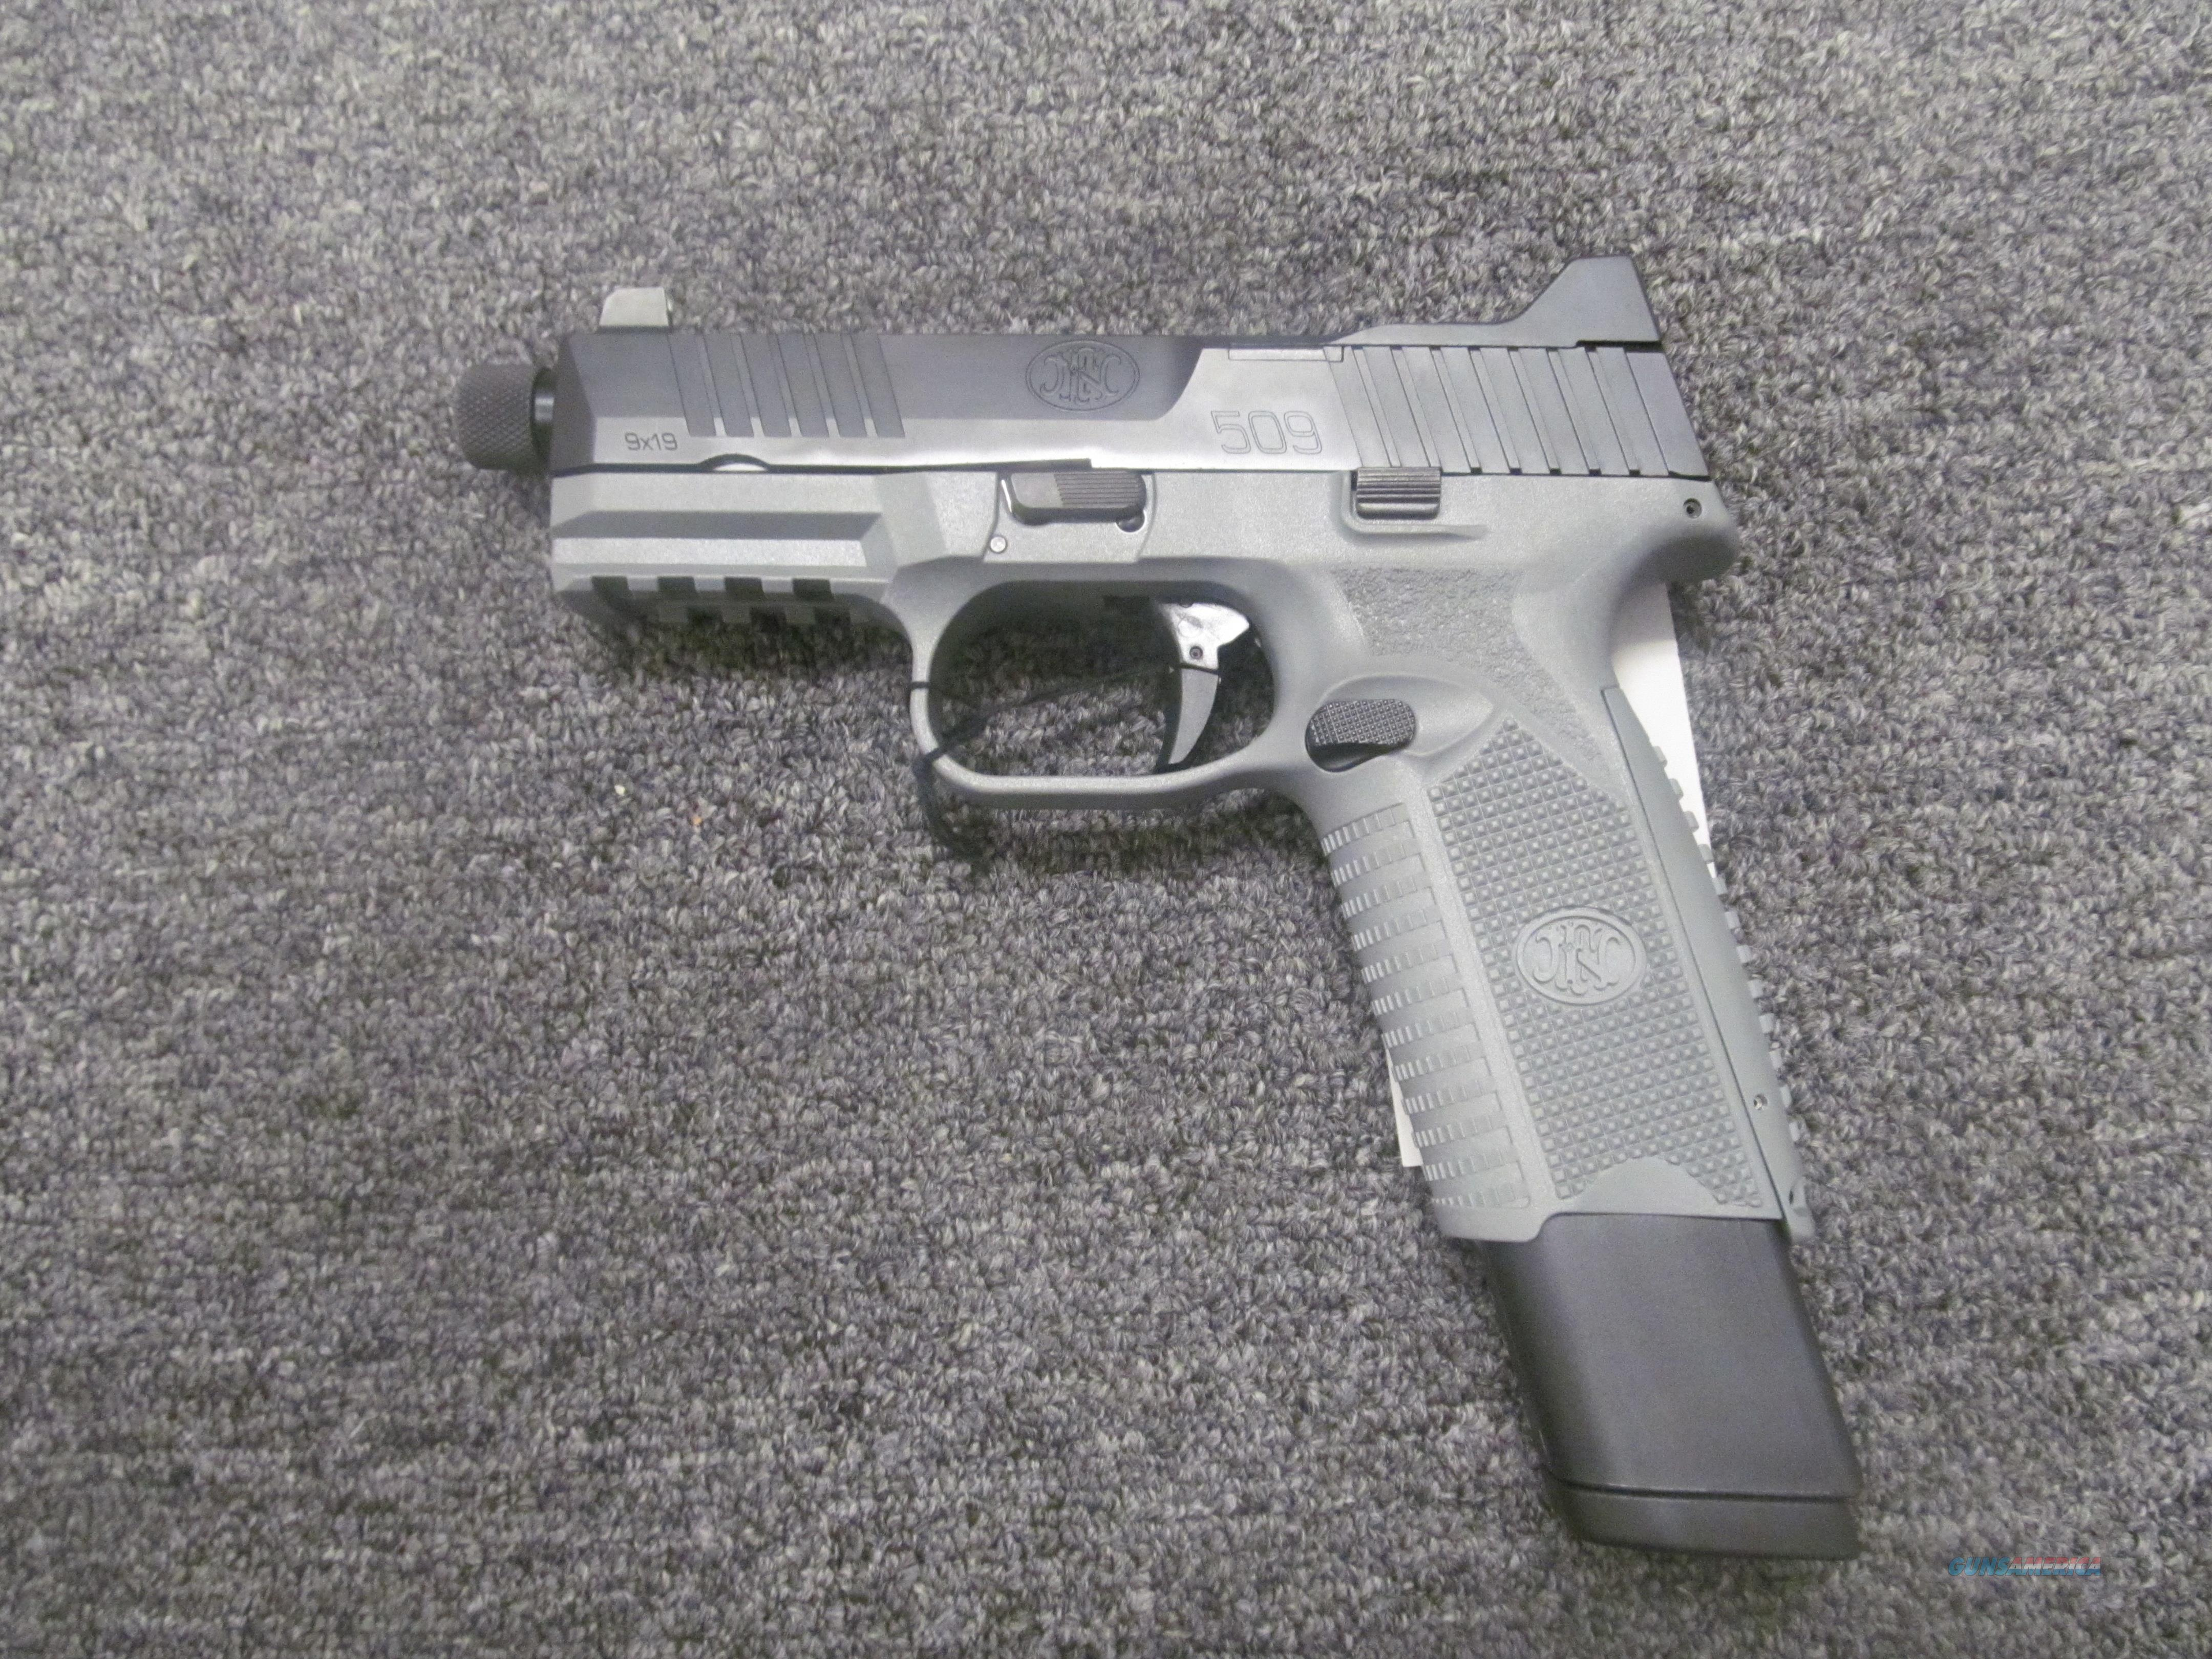 FN 509 Tactical (66-100596) w/Grey Frame  Guns > Pistols > FNH - Fabrique Nationale (FN) Pistols > FN 509